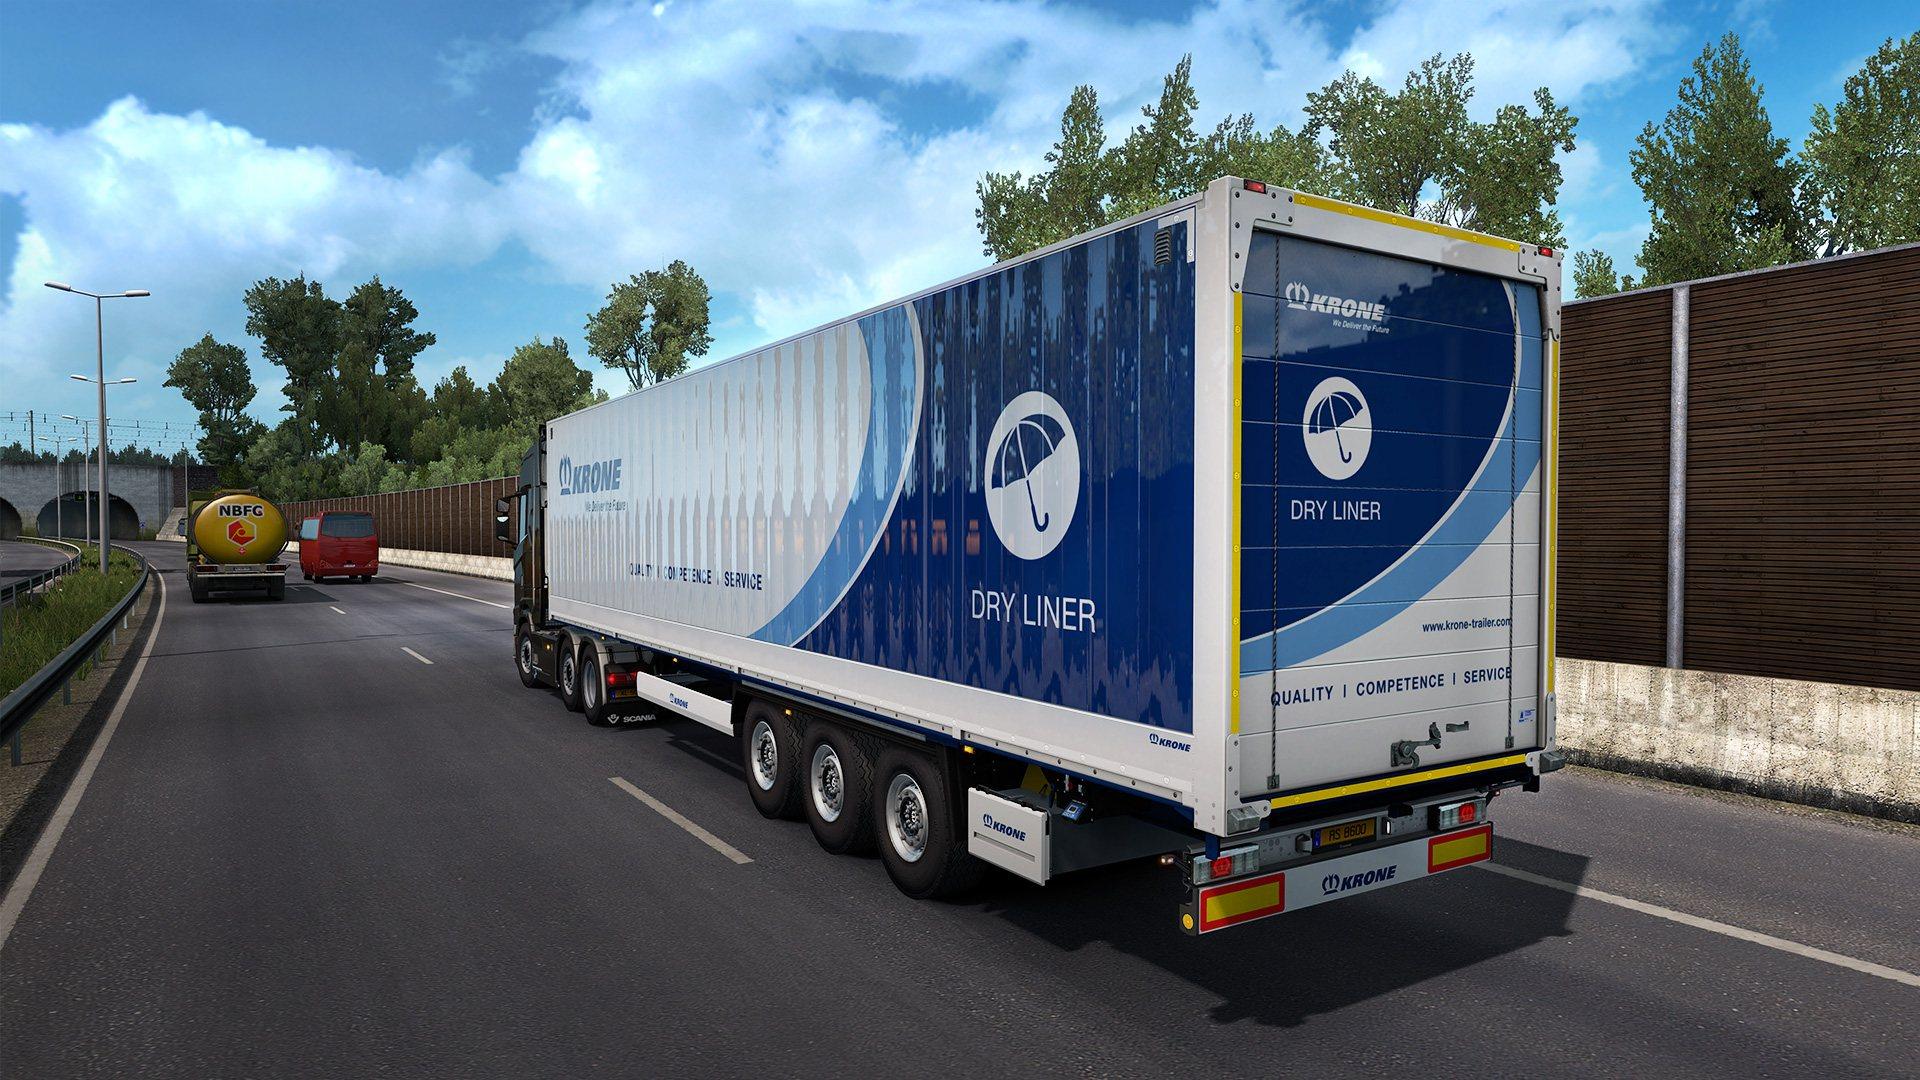 Euro Truck Simulator 2 - Krone Trailer Pack DLC Steam CD Key